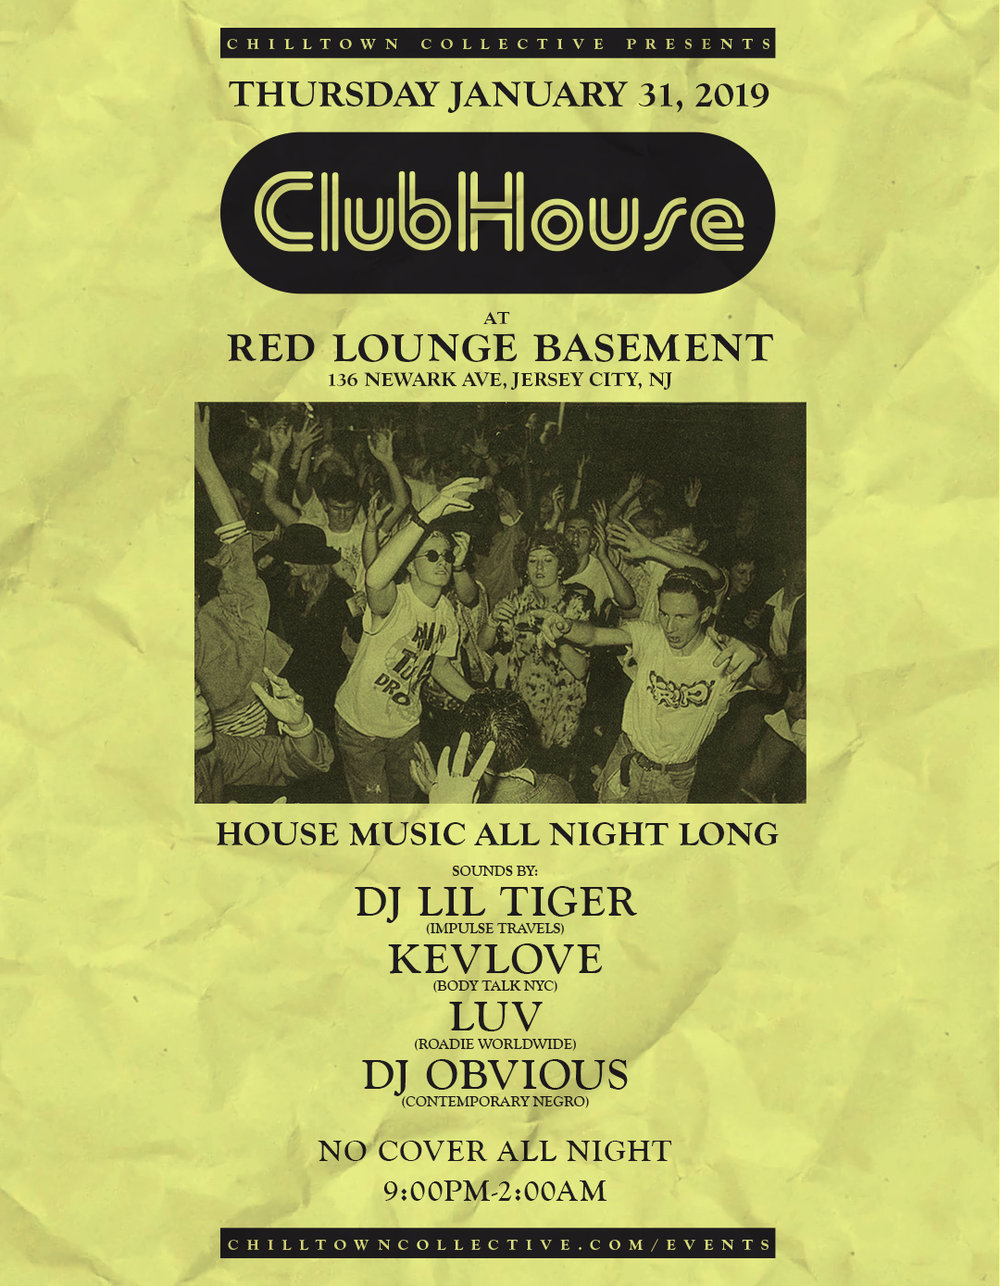 clubhouse-JAN31.jpg